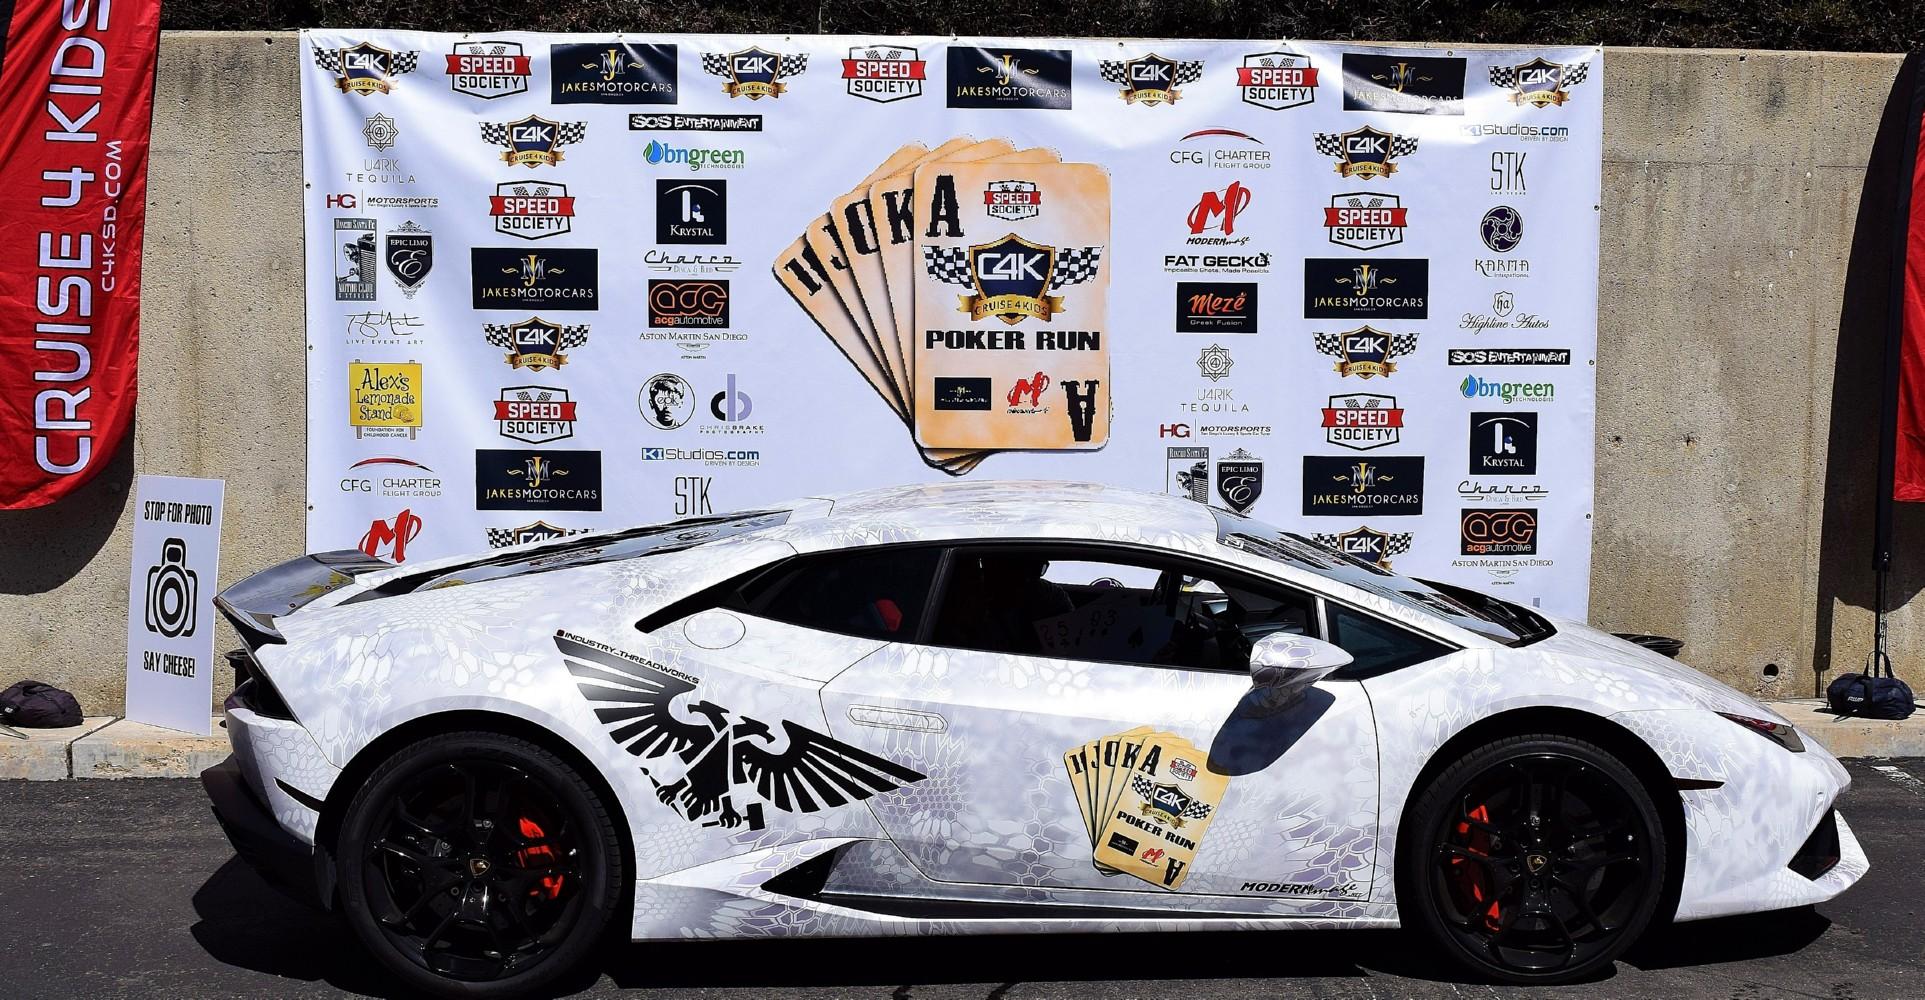 Poker Run 2017 Banner Photos - 3.jpg